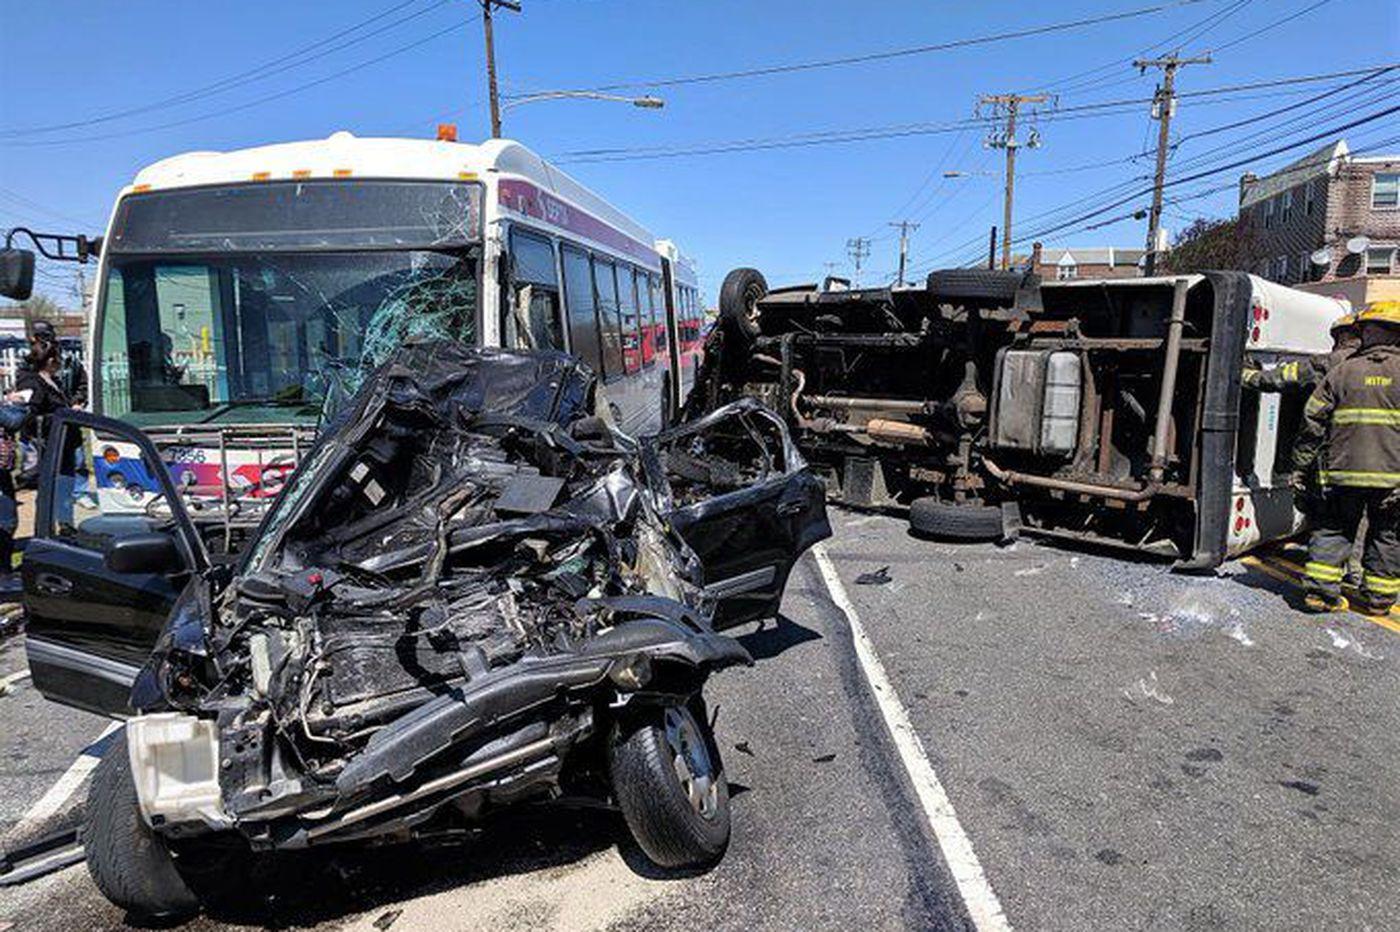 8 hurt in crash involving SEPTA bus, 2 other vehicles